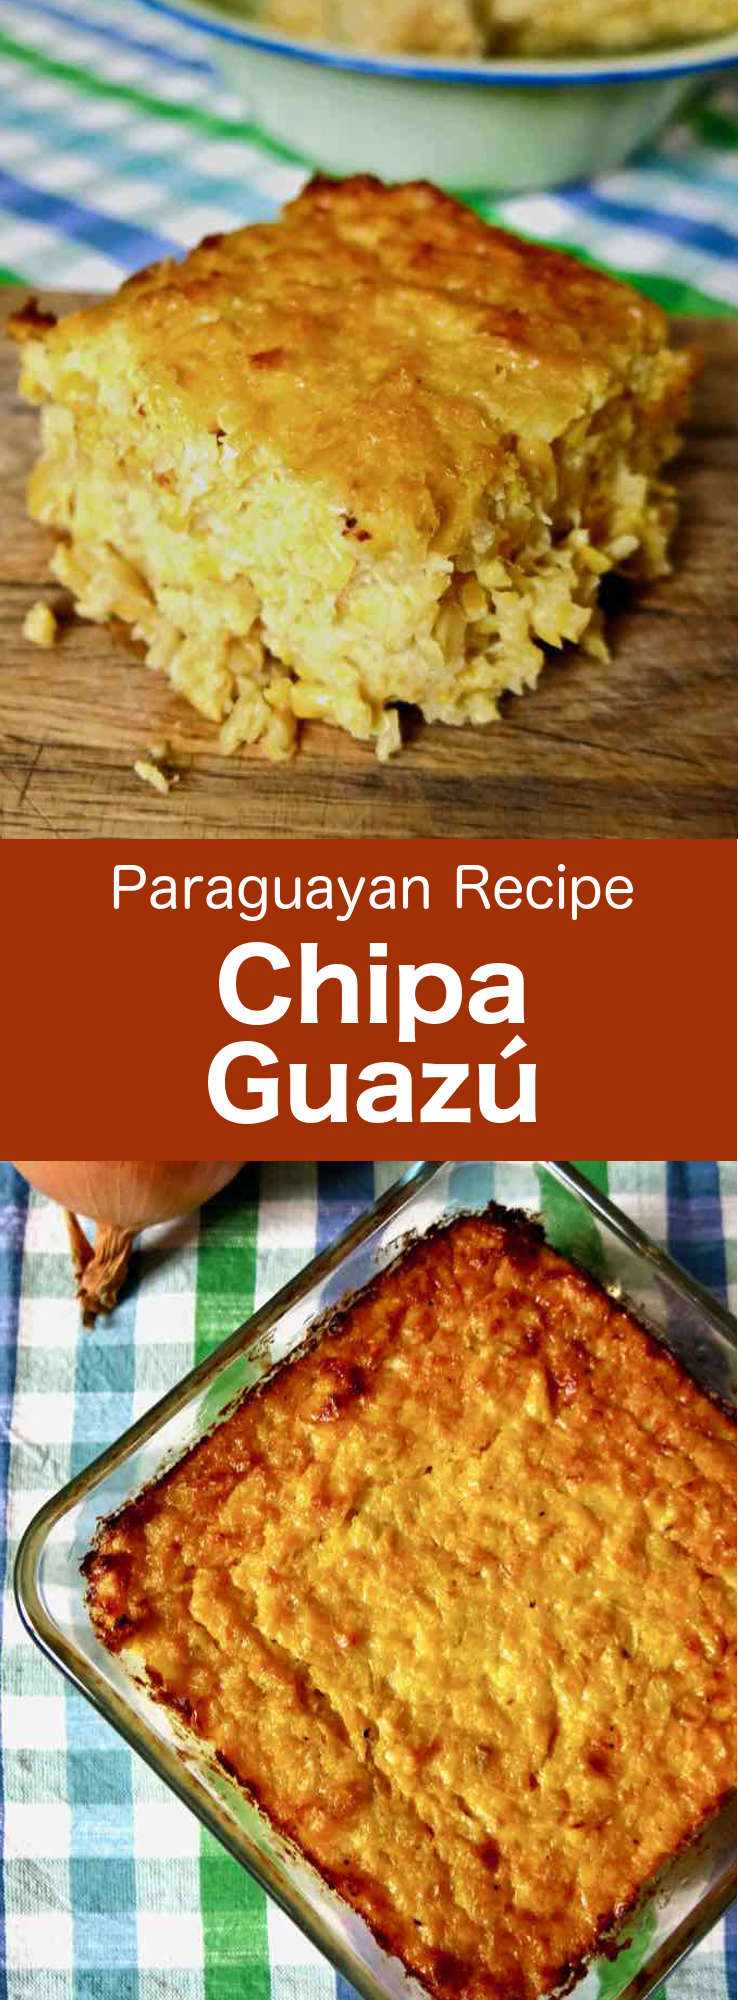 Chipa guazú (sometimes spelled